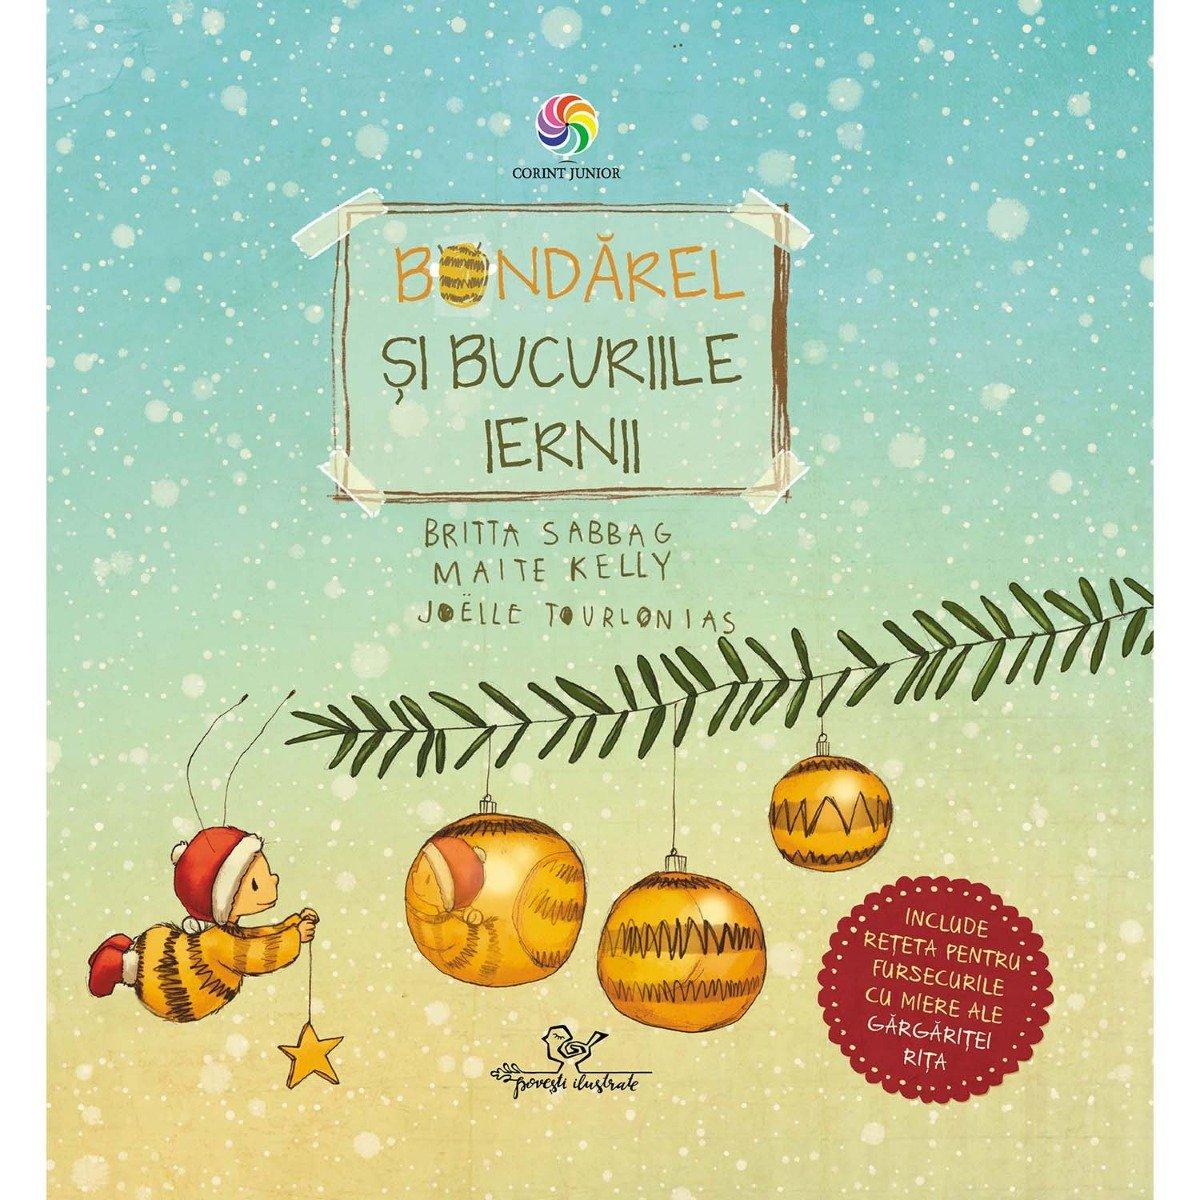 Carte Editura Corint, Bondarel si bucuriile iernii, Britta Sabbag, Maite Kelly, Joelle Tourlonais